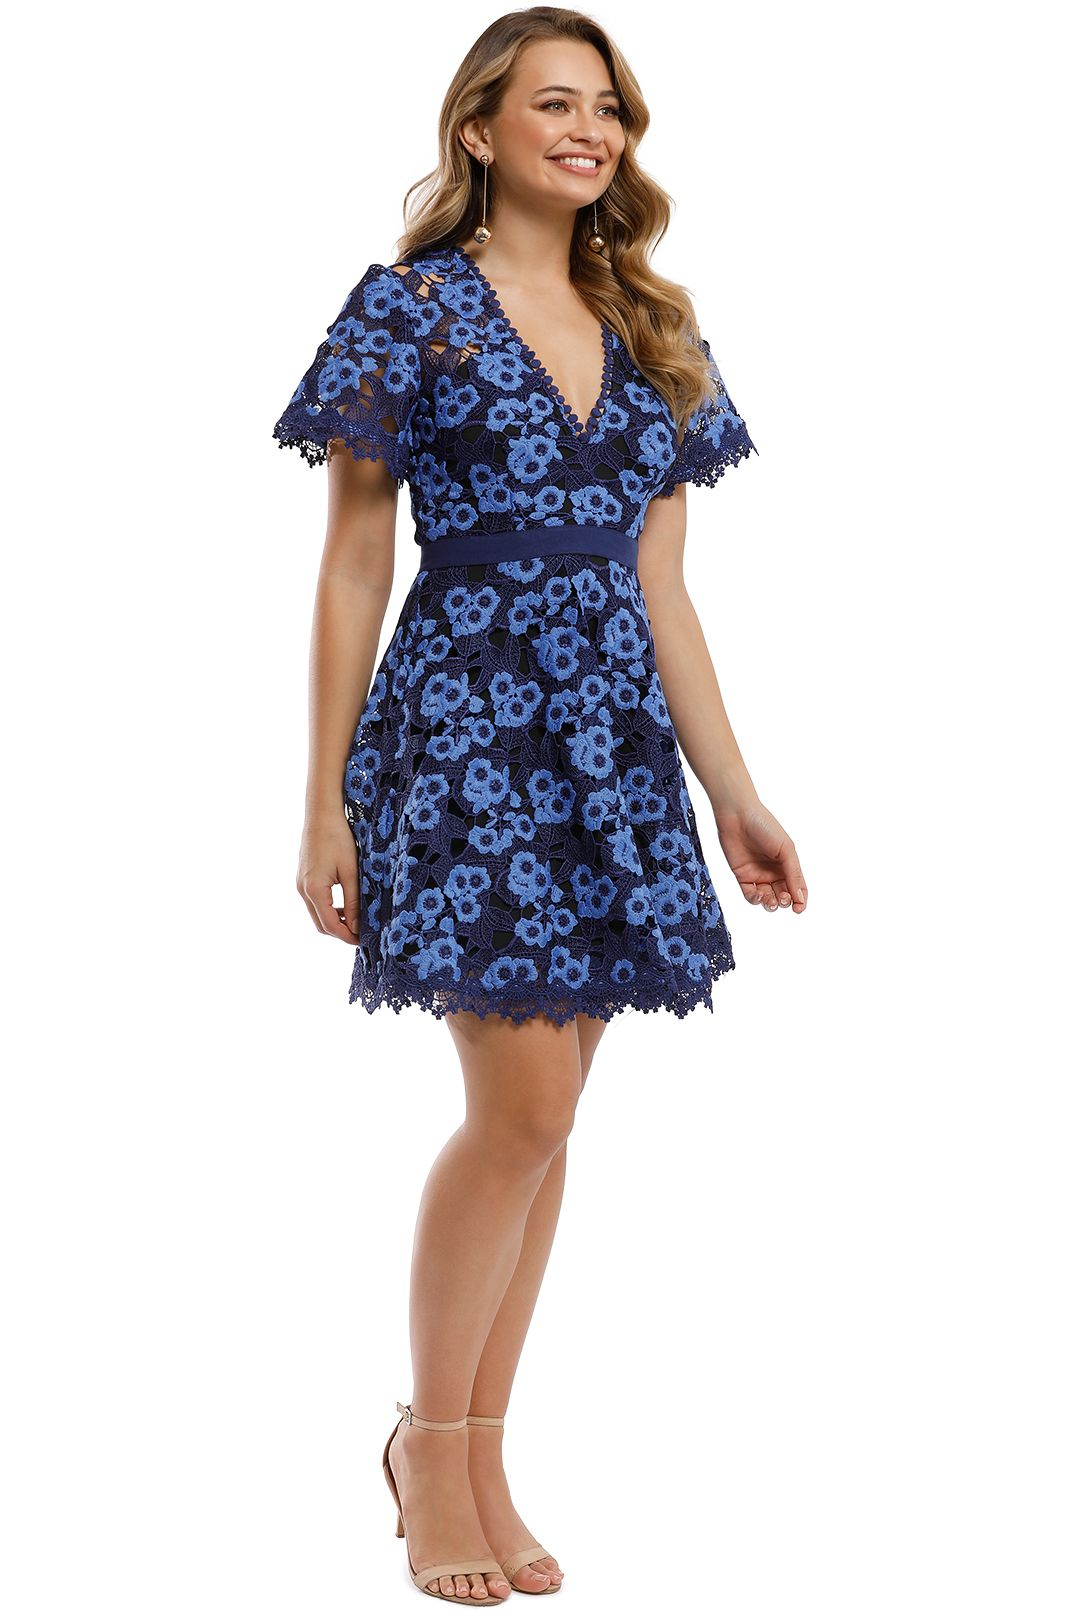 Talulah - Infatuation Mini Dress - Navy - Side